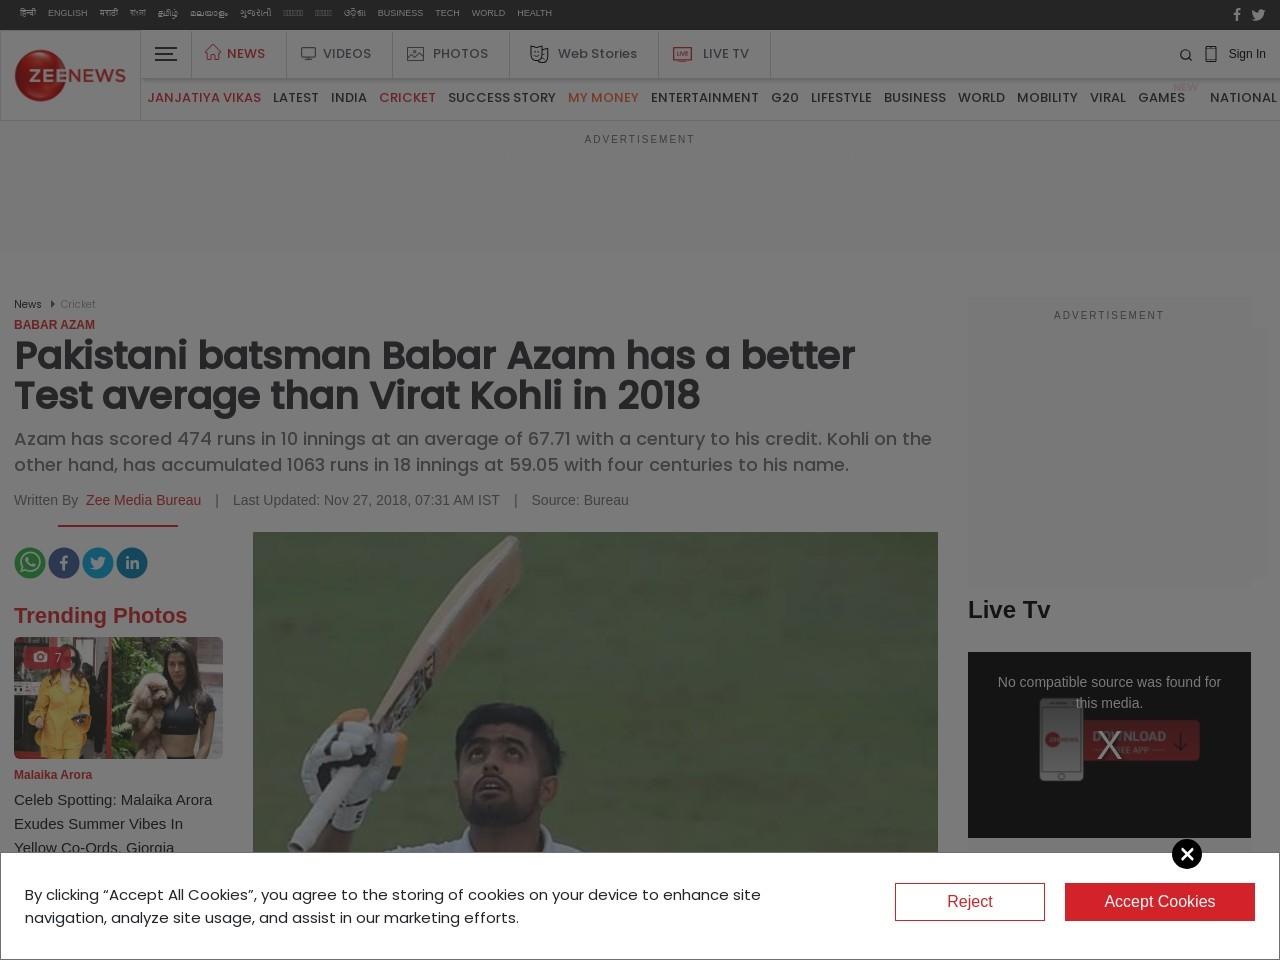 This Pakistani batsman has a better Test average than Virat Kohli in 2018